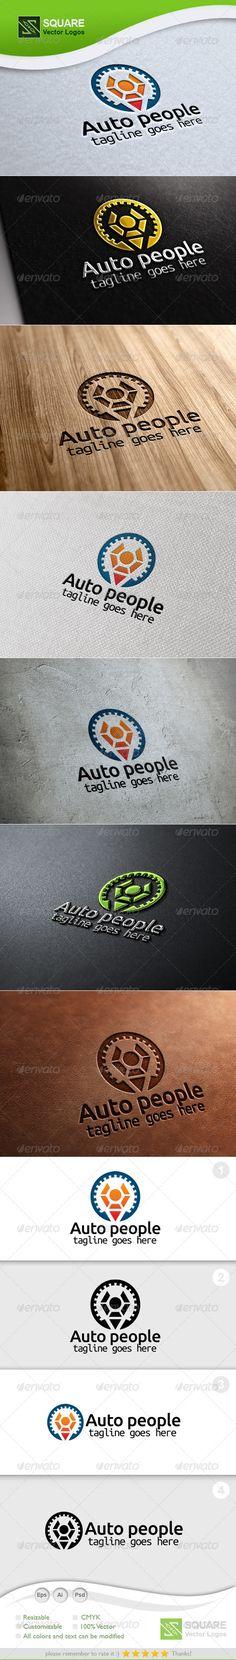 Gear Human Vector  - Logo Design Template Vector #logotype Download it here: http://graphicriver.net/item/gear-human-vector-logo-template/5886179?s_rank=1393?ref=nesto